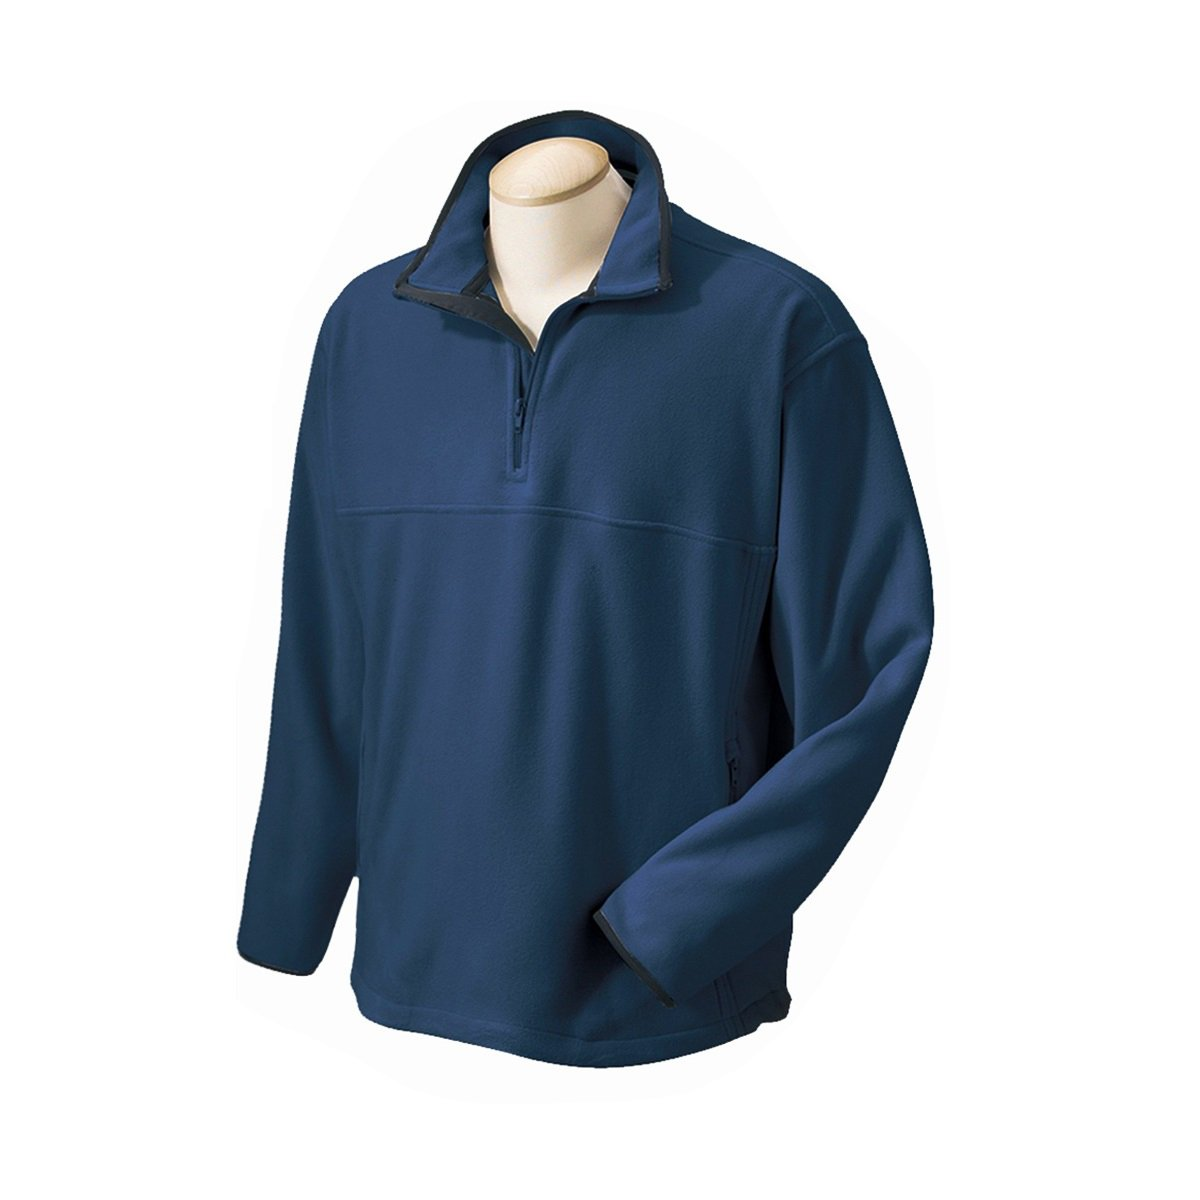 Chestnut Hill Mens Navy Fleece 1/4 Zip Pullover Sweatshirt Jacket with Pockets